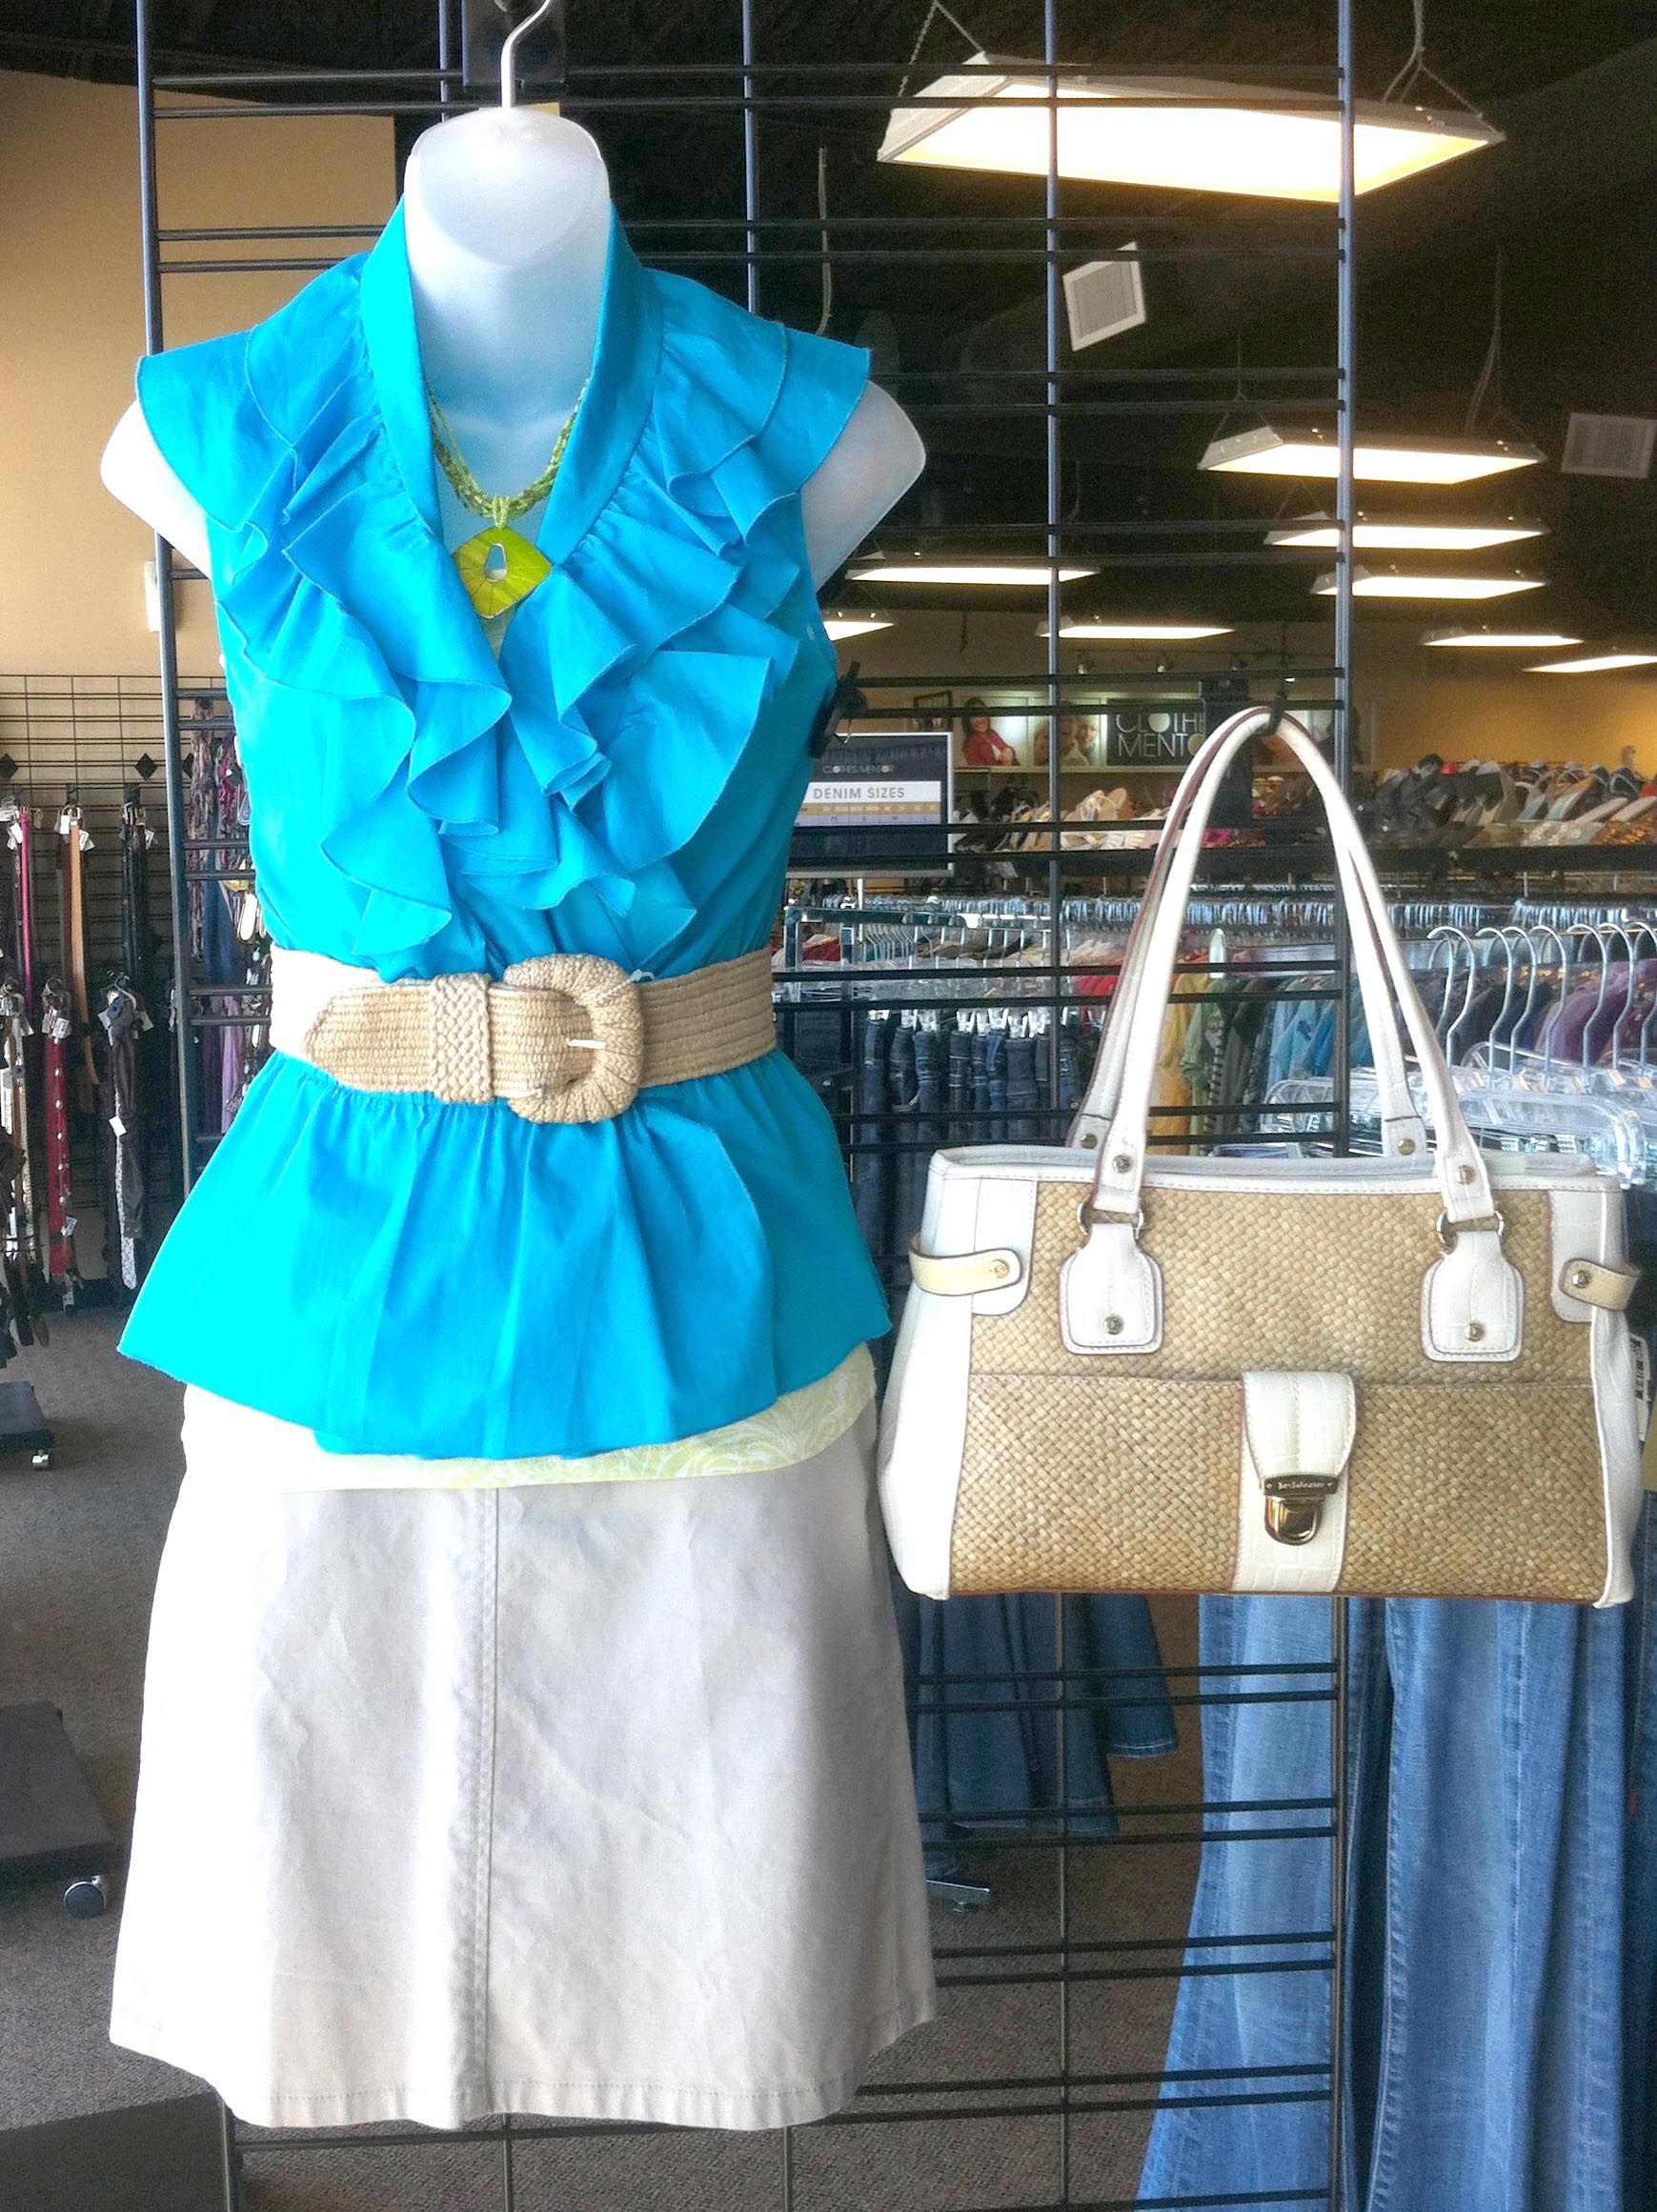 Blue ruffled sleeveless top with white skirt